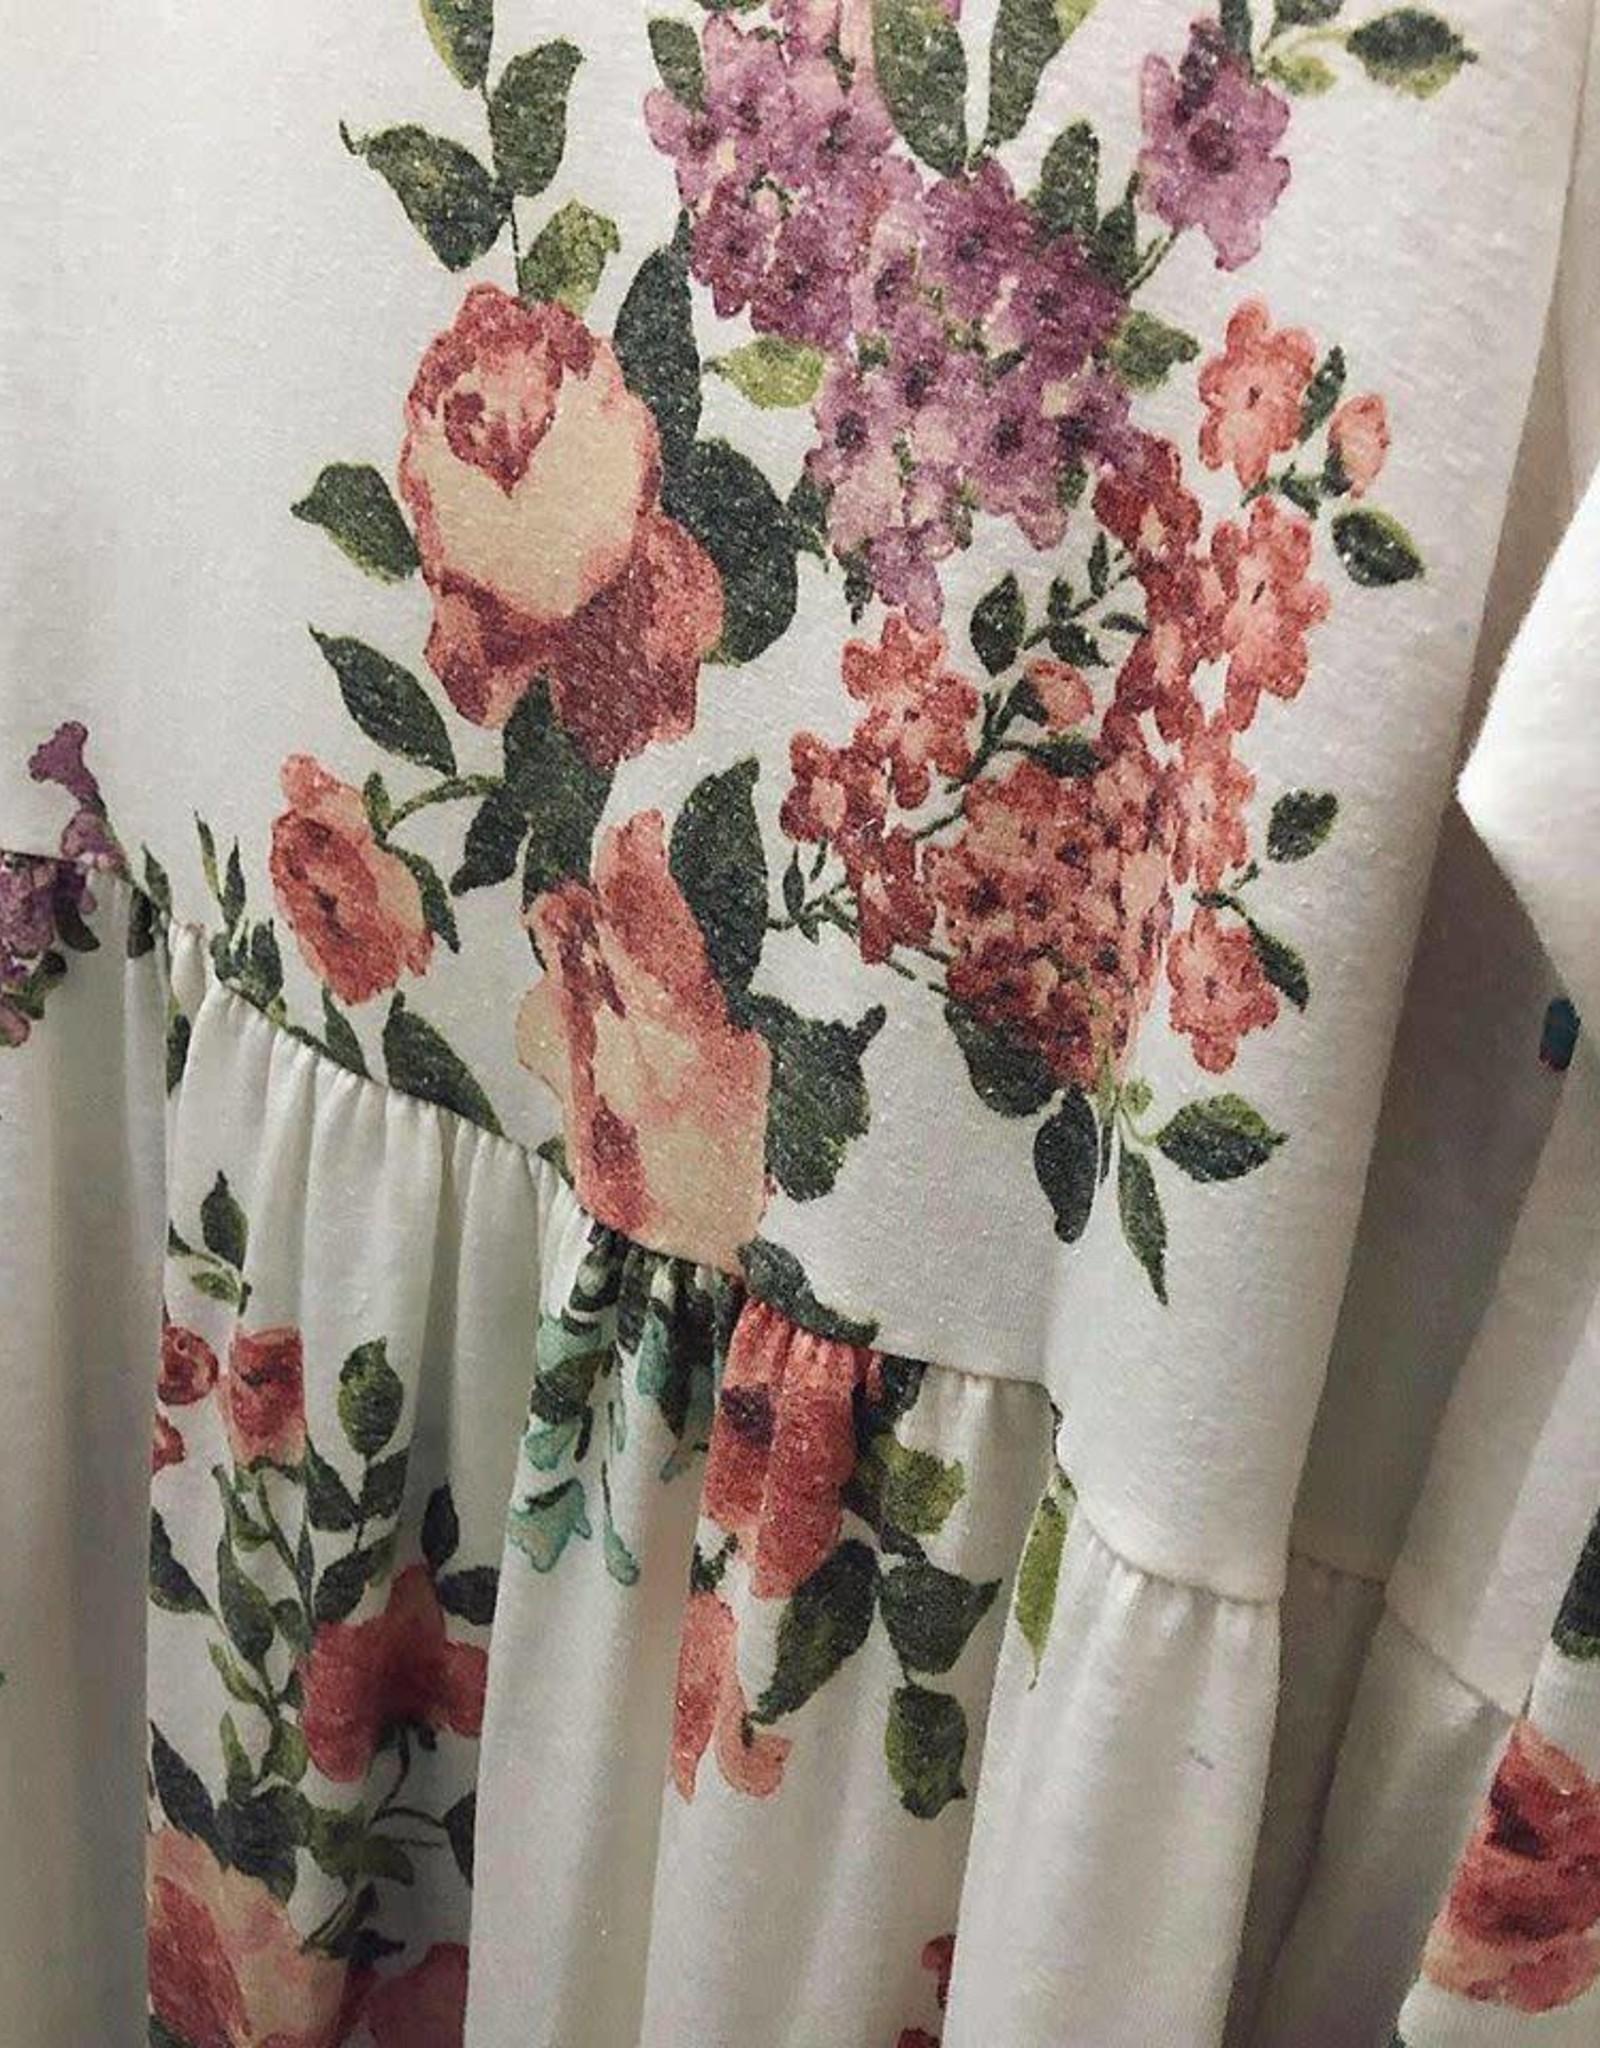 Knee Length Long Sleeve Floral Dress in Cream